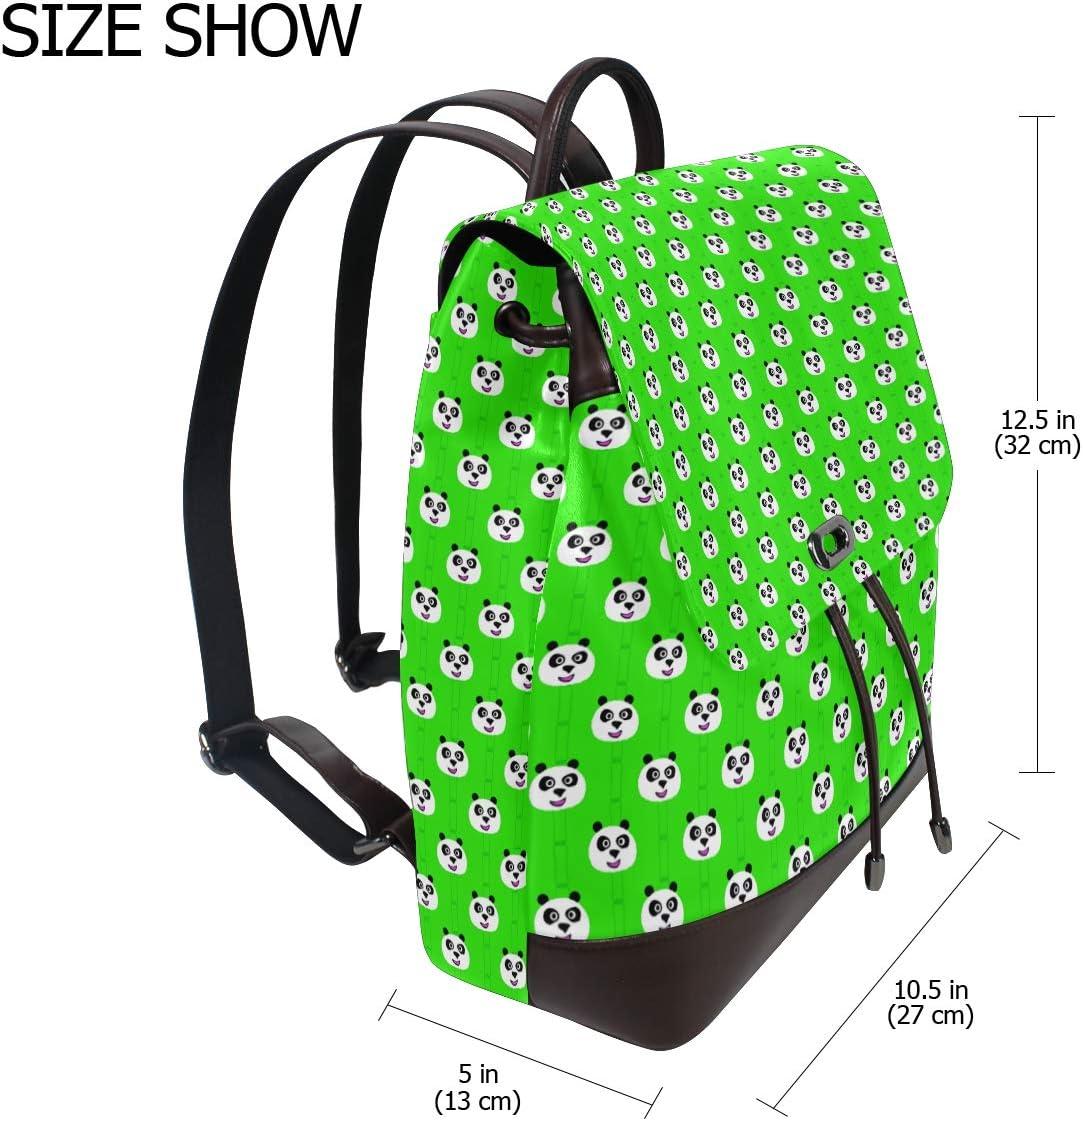 Leather Pandas Head Bamboo Green Backpack Daypack Bag Women